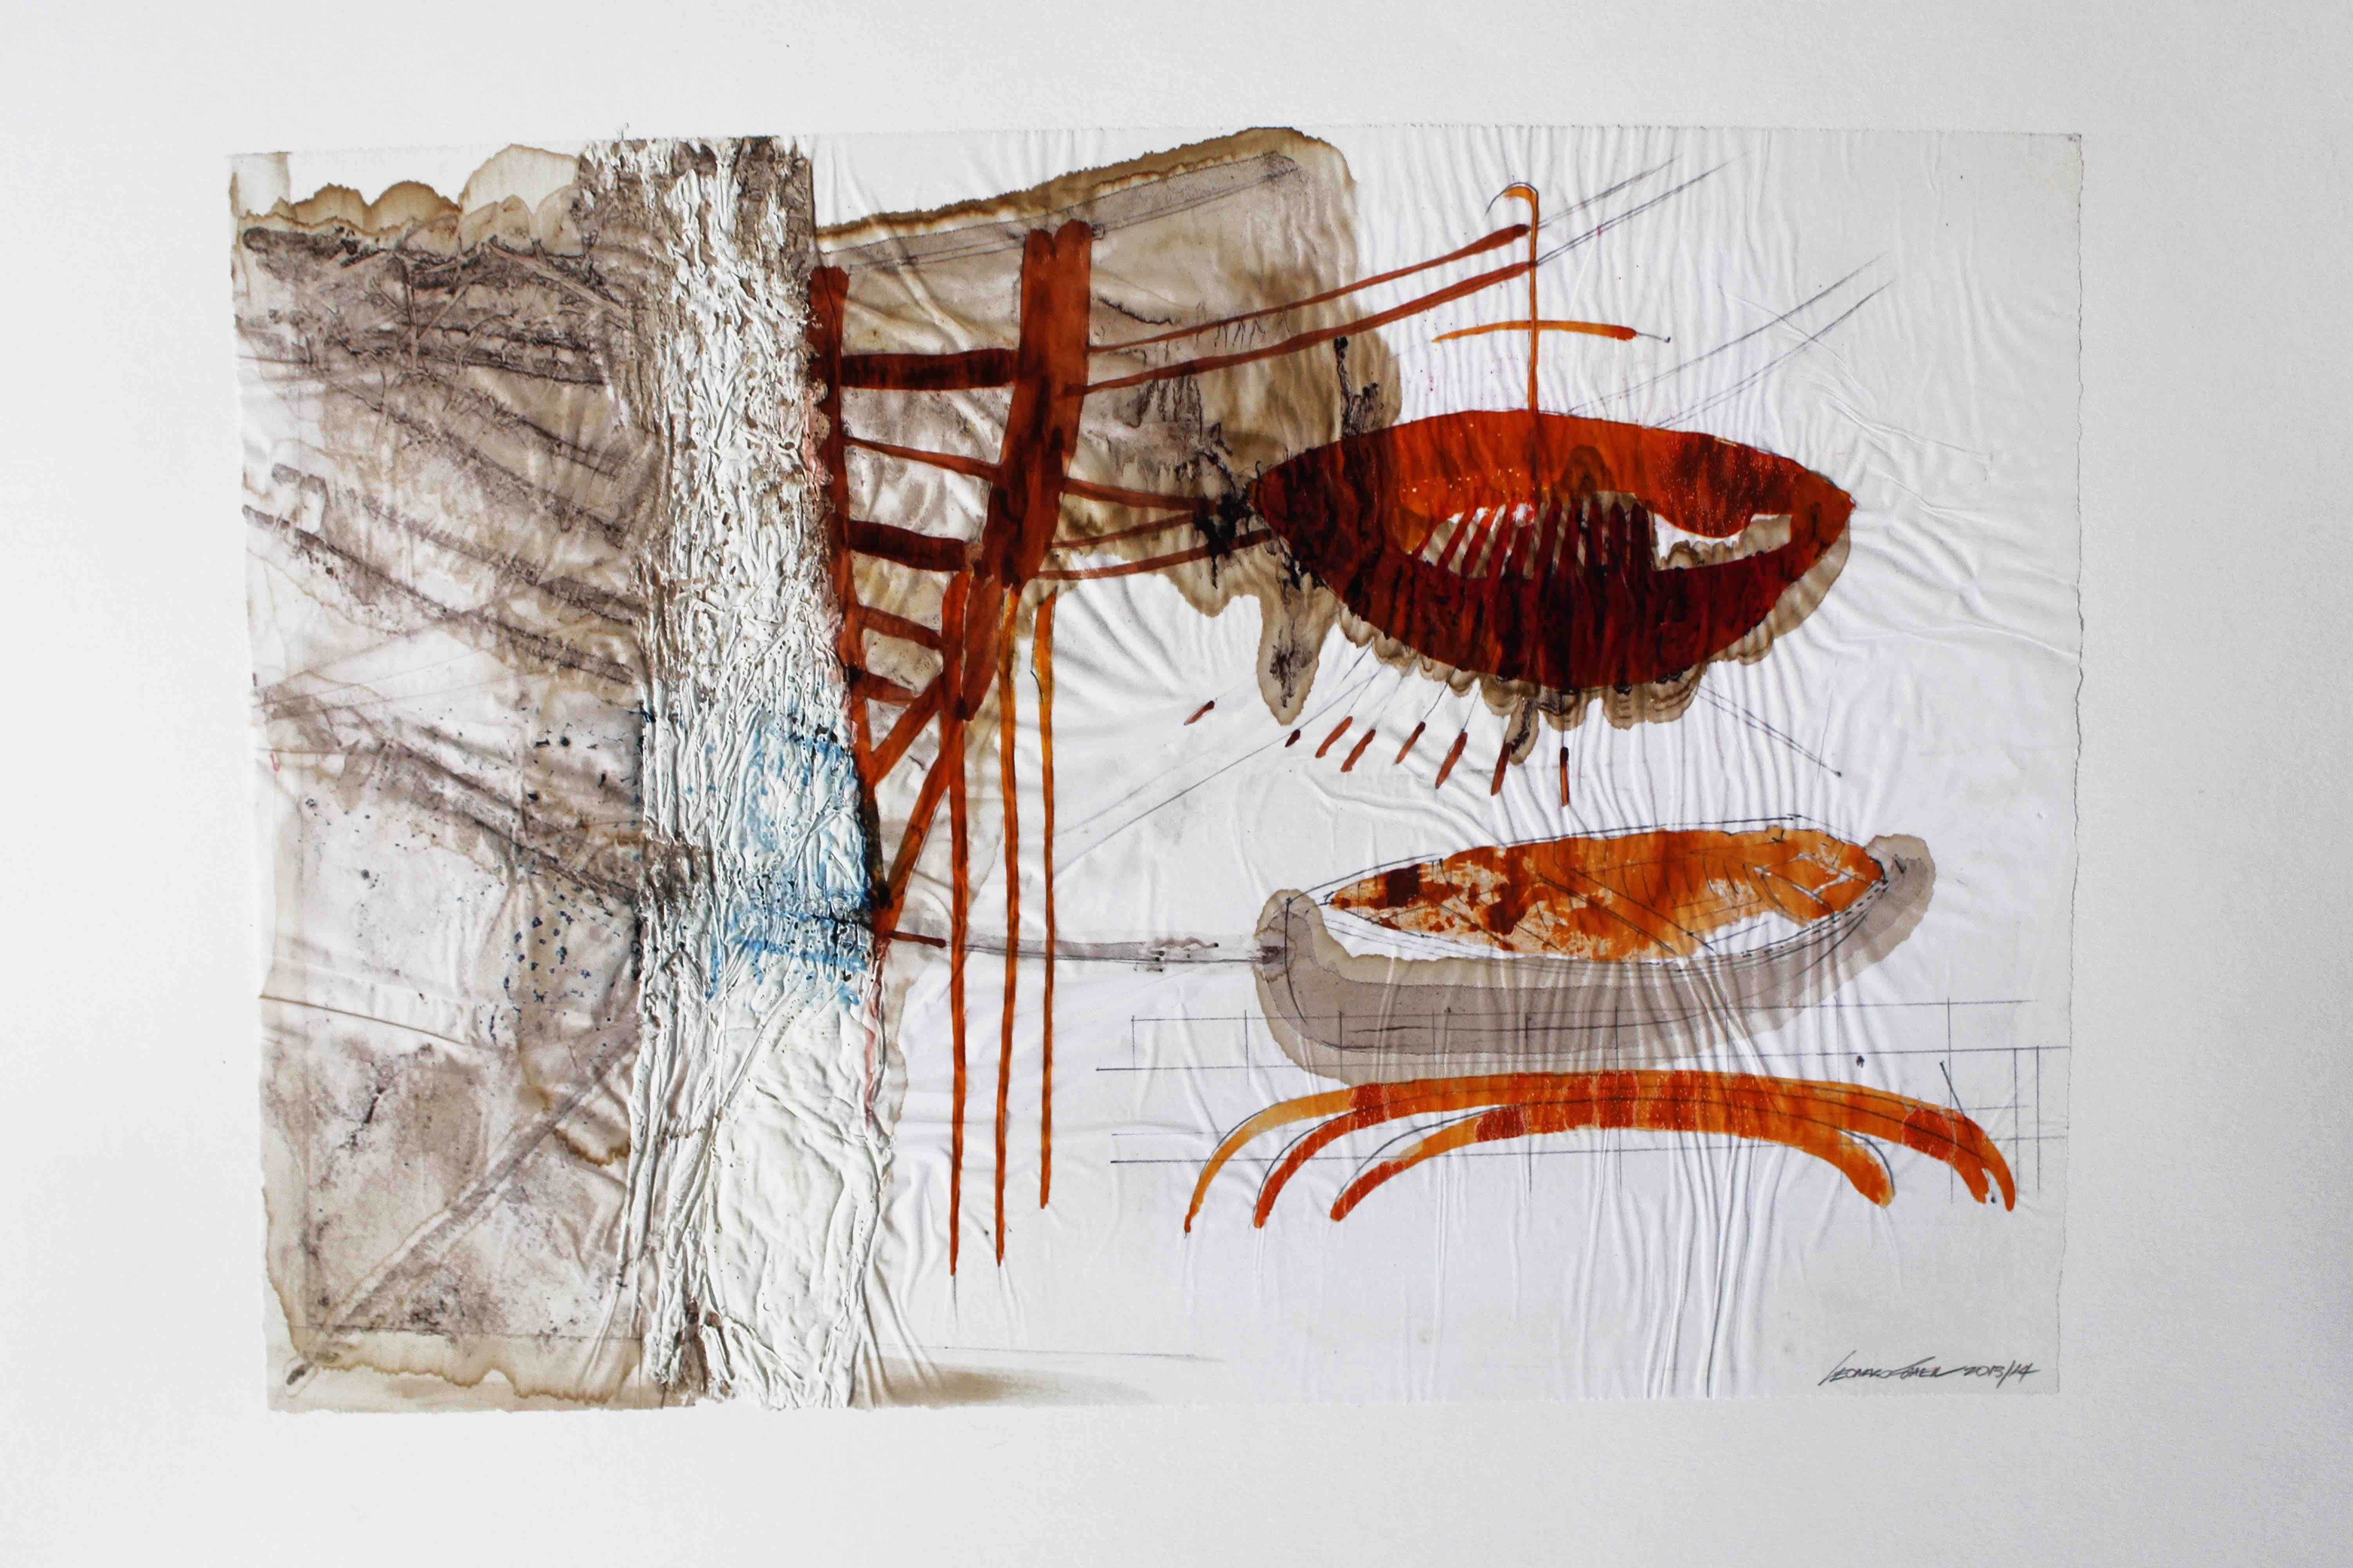 Leonard Sheil: Houseboat Nr.4, 2014